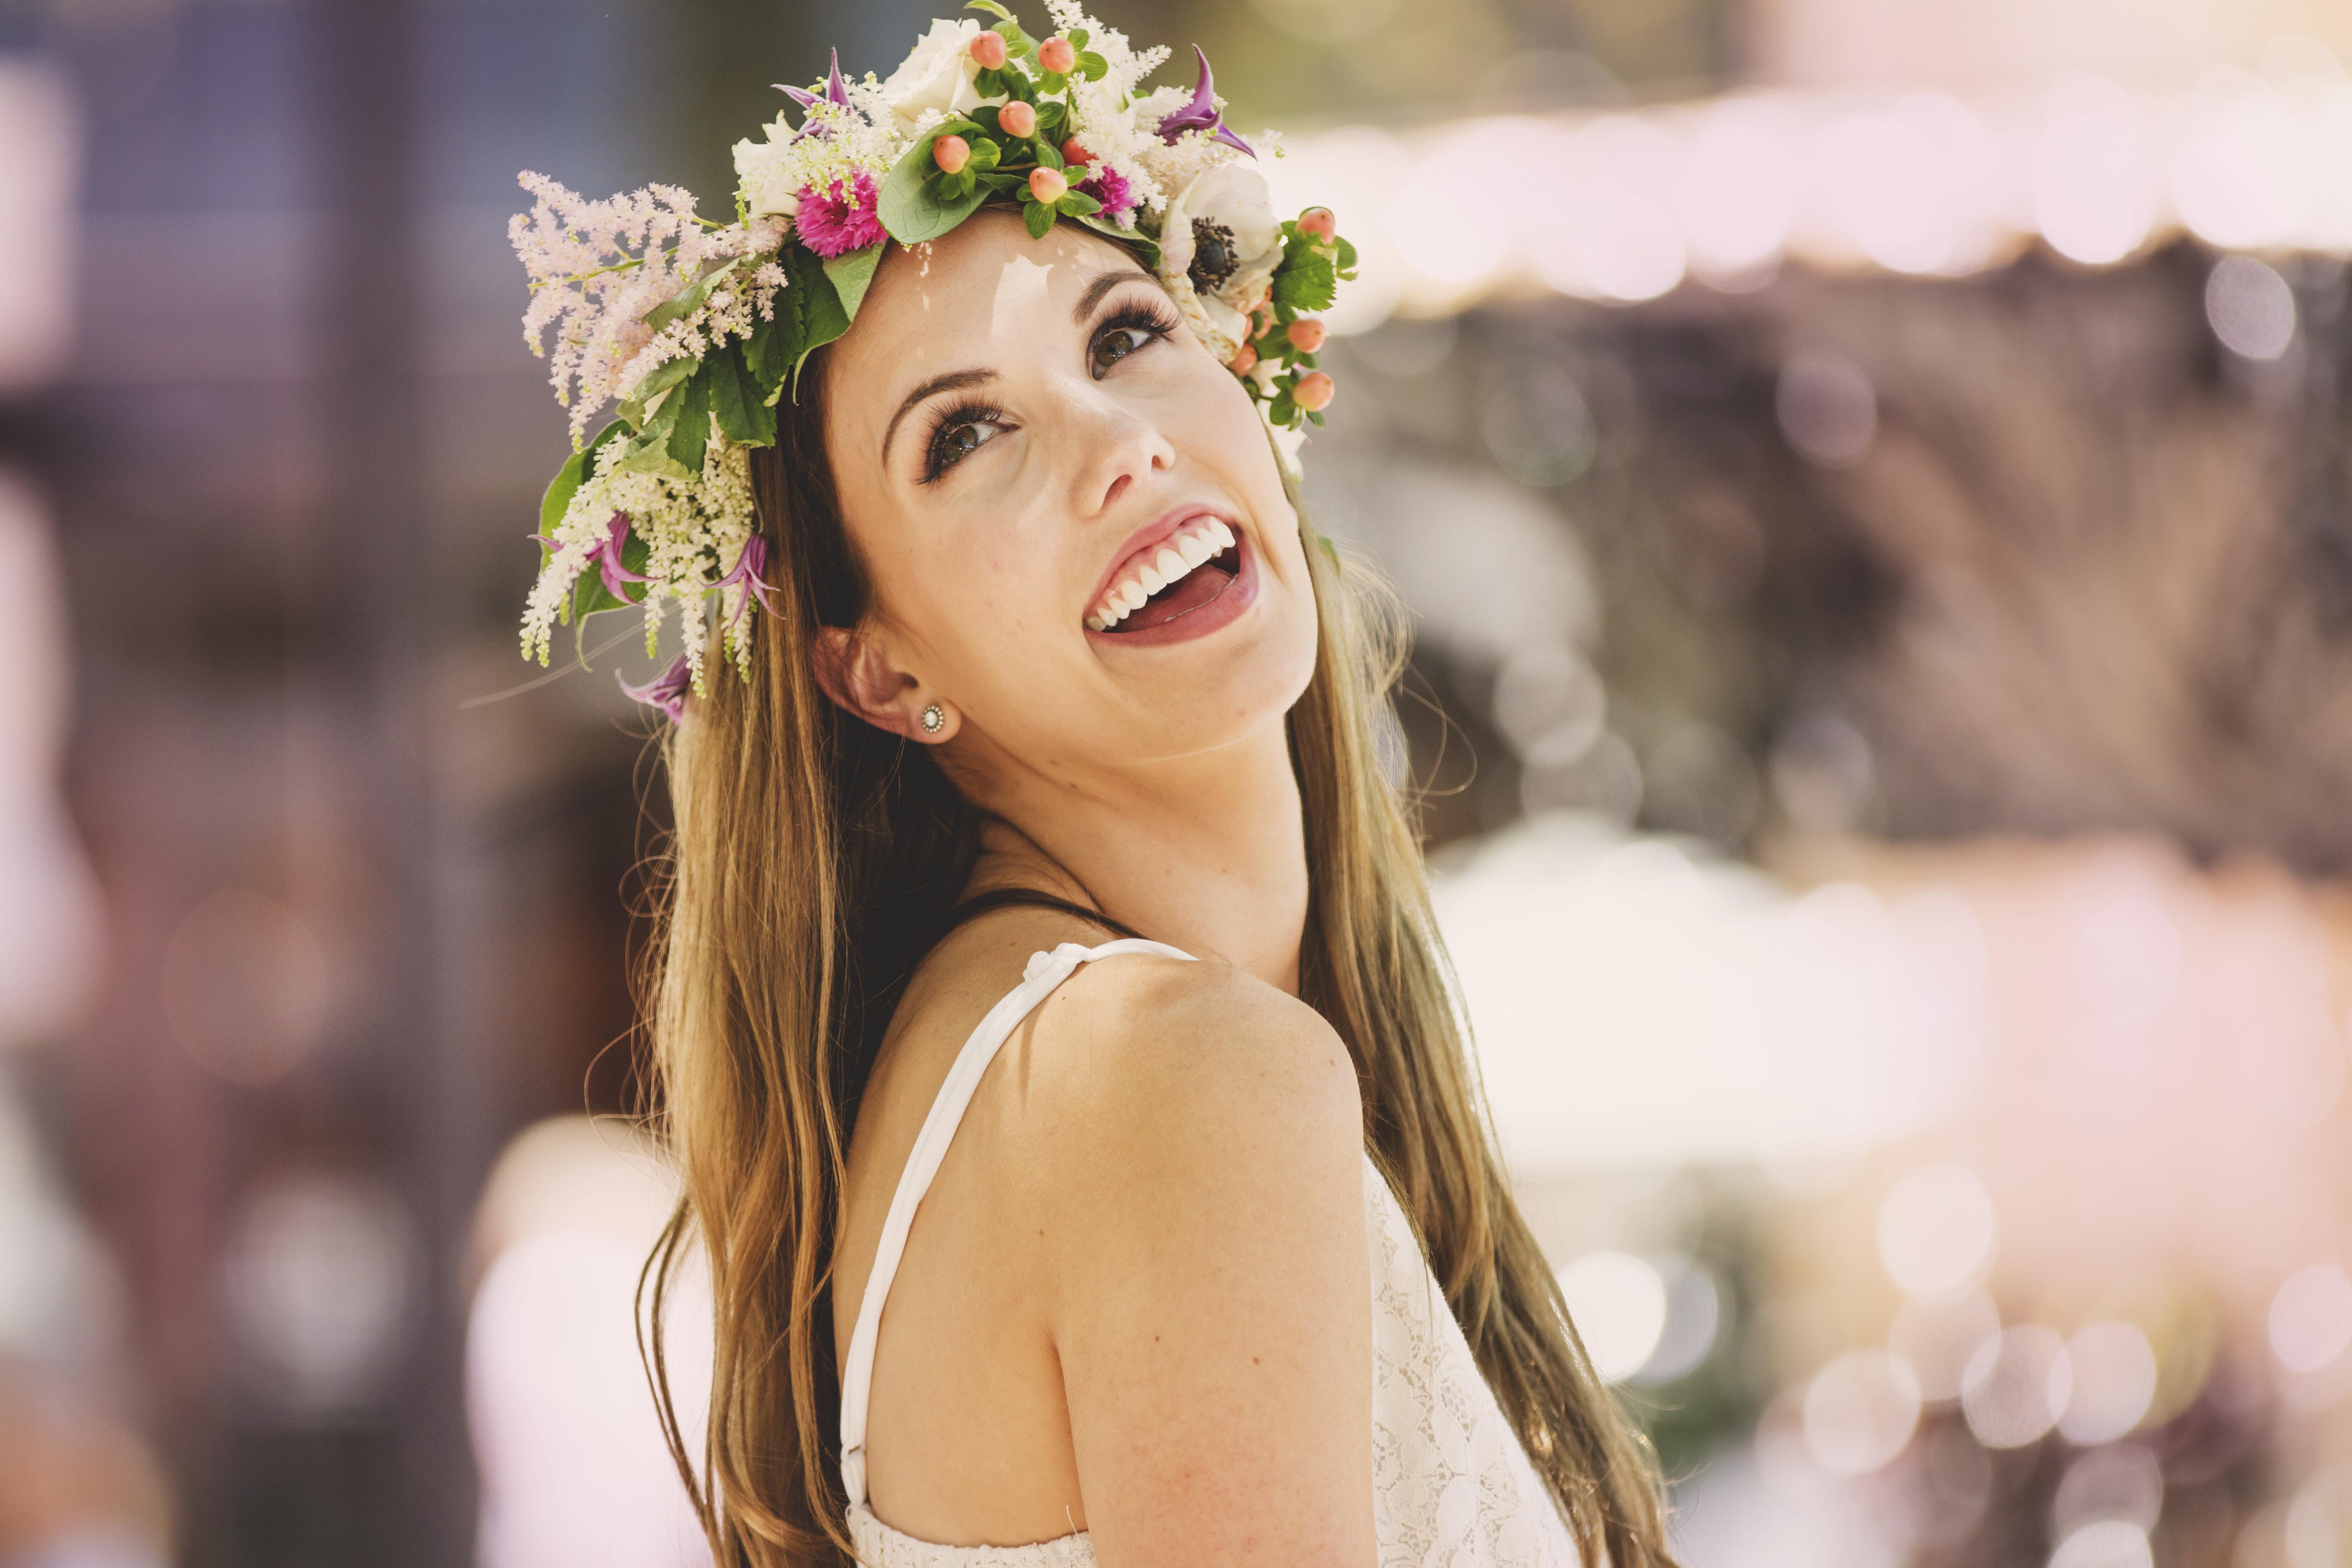 Flower Crown Bachelorette Party - TrueBlu  5c7f1cb28251